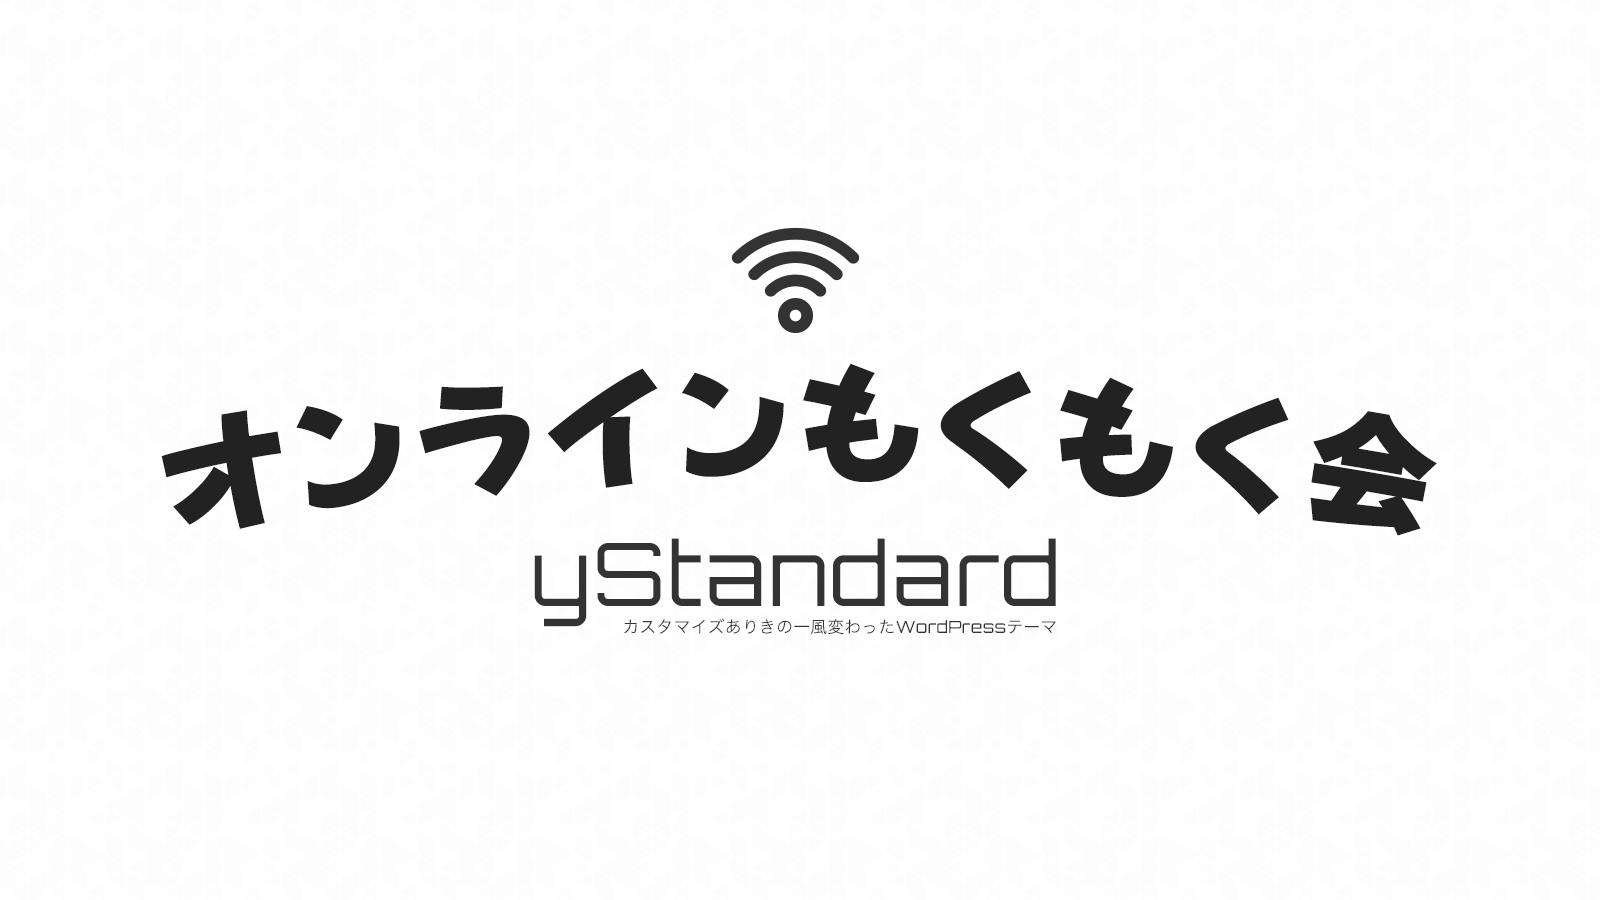 yStnadard オンラインもくもく勉強会を始めます!